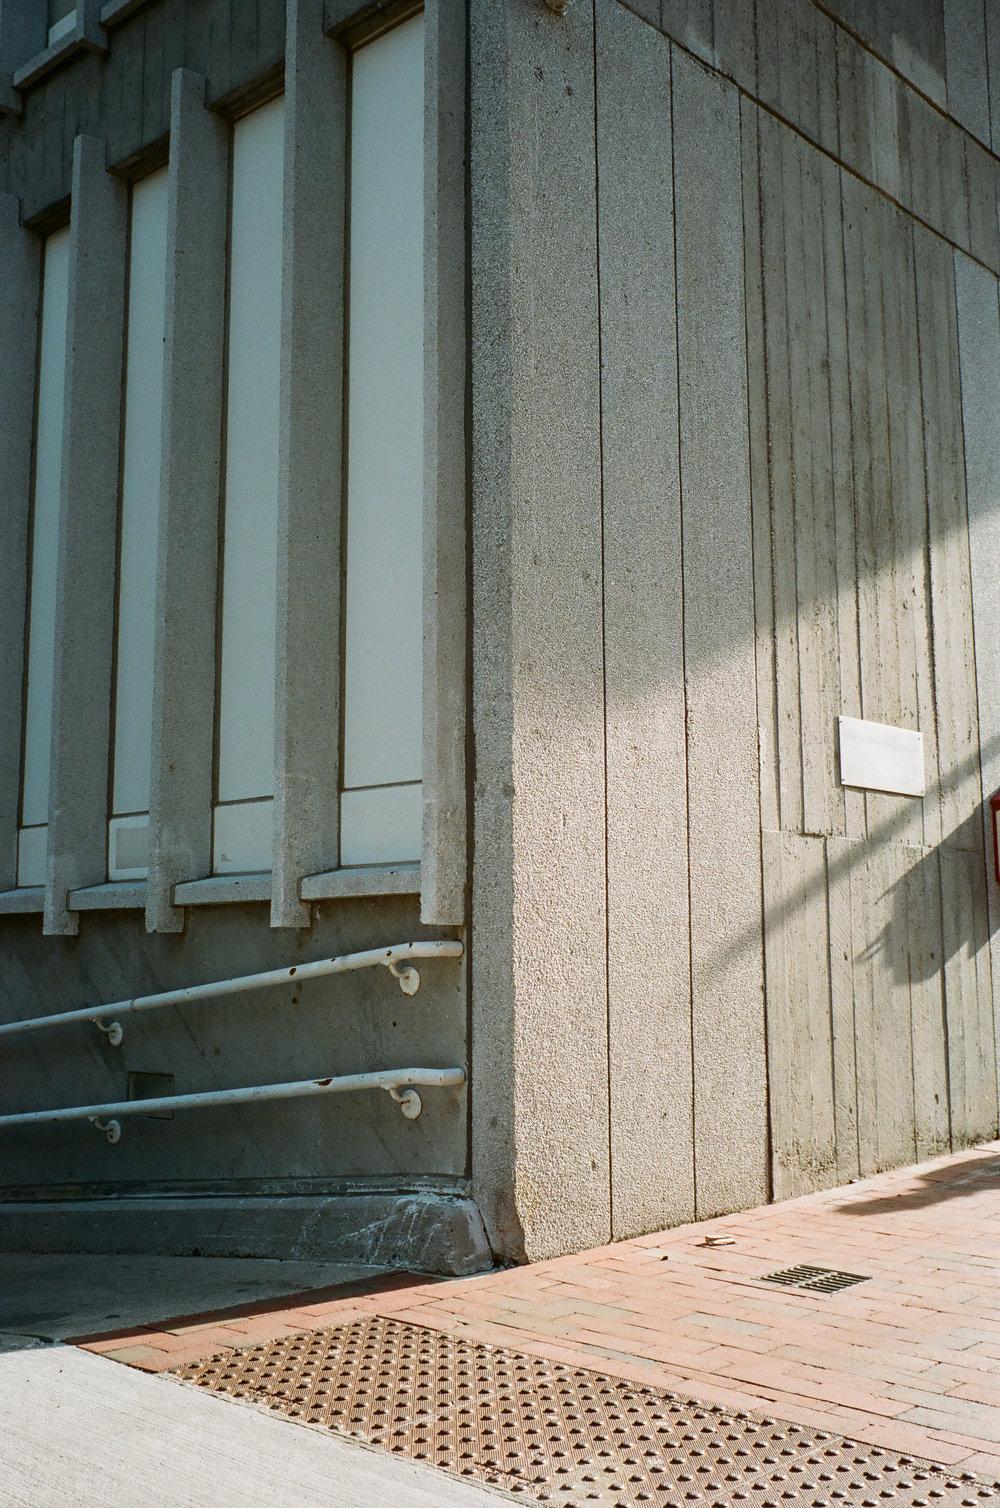 LeicaM6112018-1018.jpg